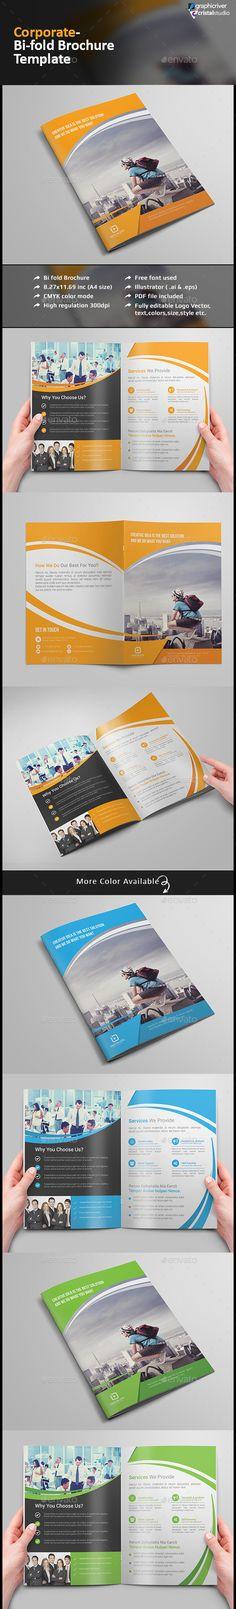 Multipurpose Bi-fold Brochure Vector Template EPS, AI #design Download: http://graphicriver.net/item/bifold-brochuremultipurpose/13535213?ref=ksioks